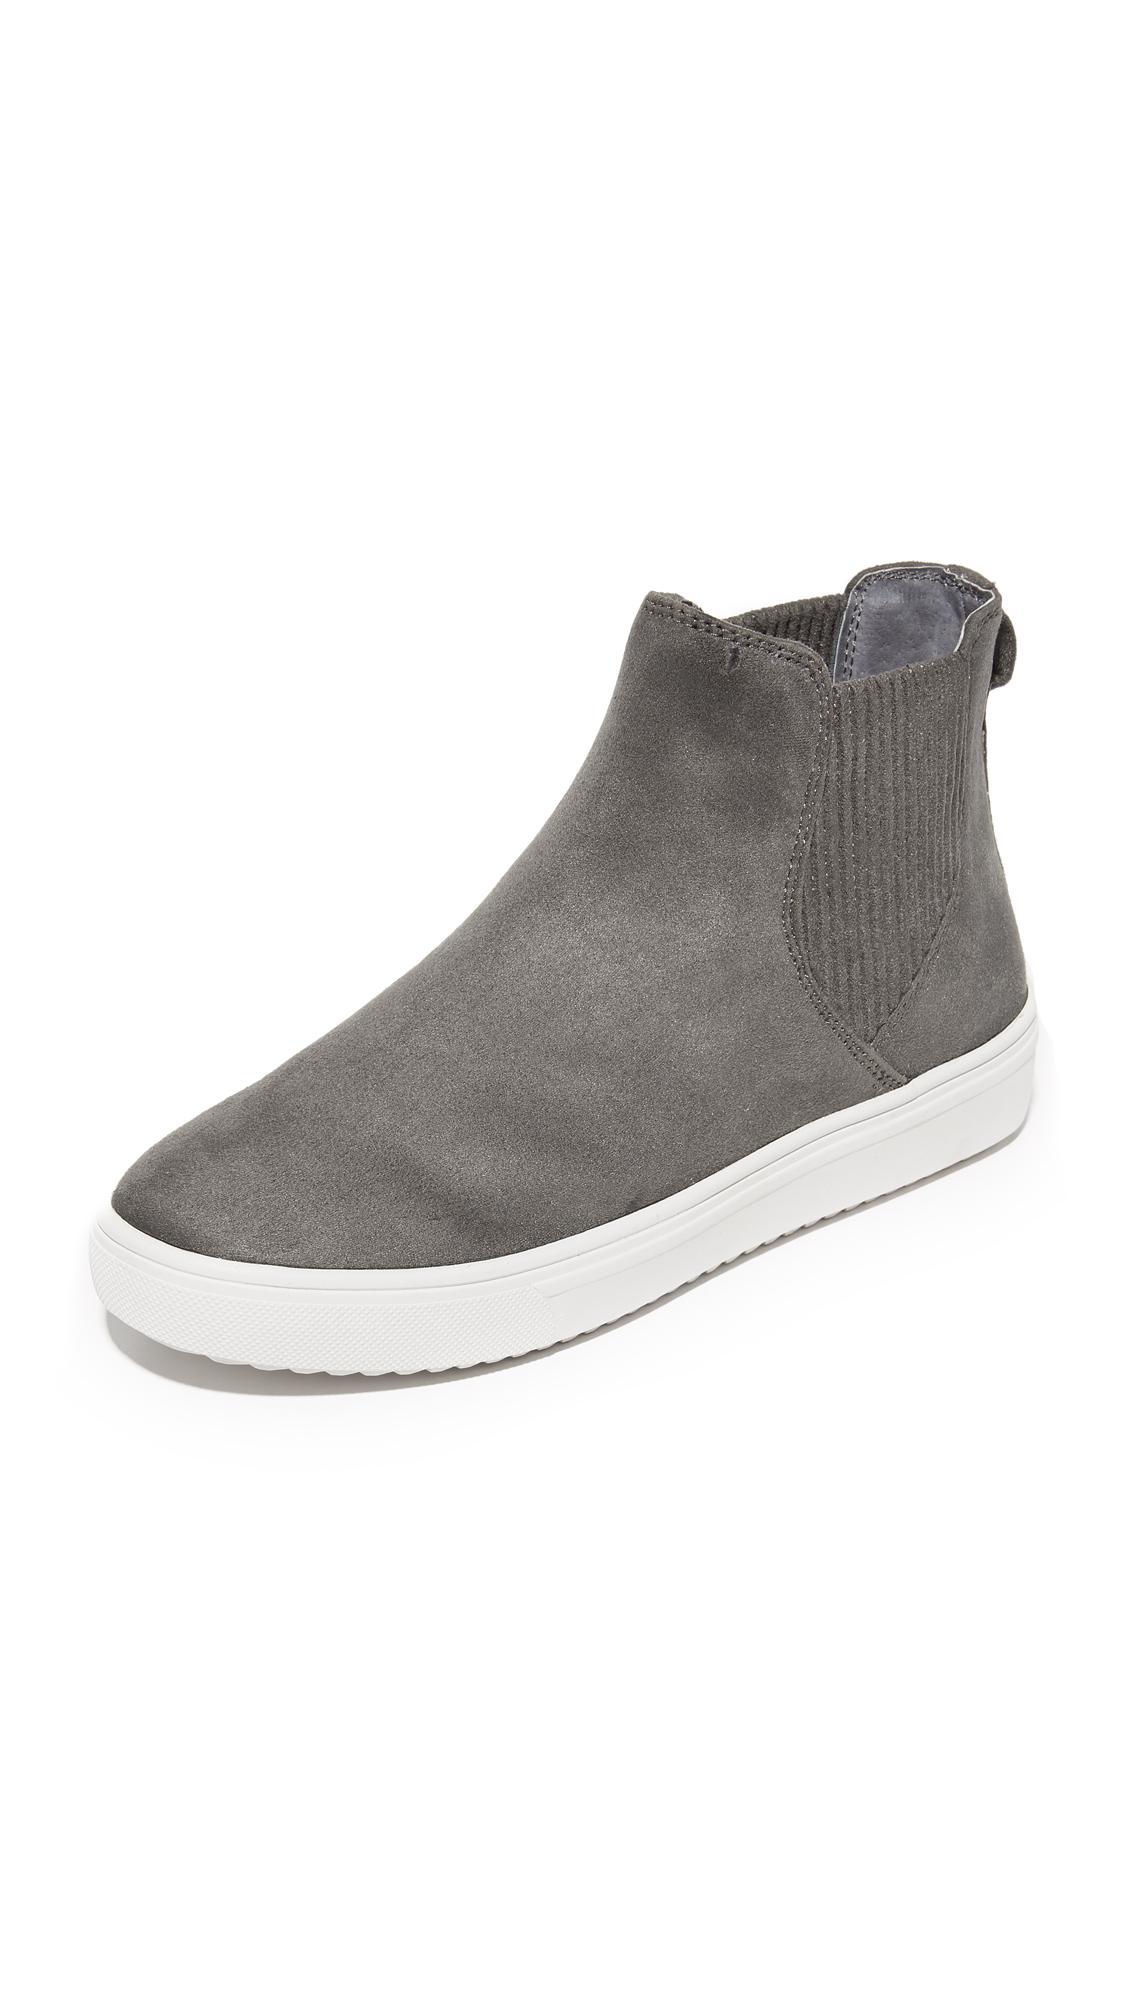 5e05fb4ea88 Lyst - Steven by Steve Madden Coal Platform Chelsea Sneakers in Gray